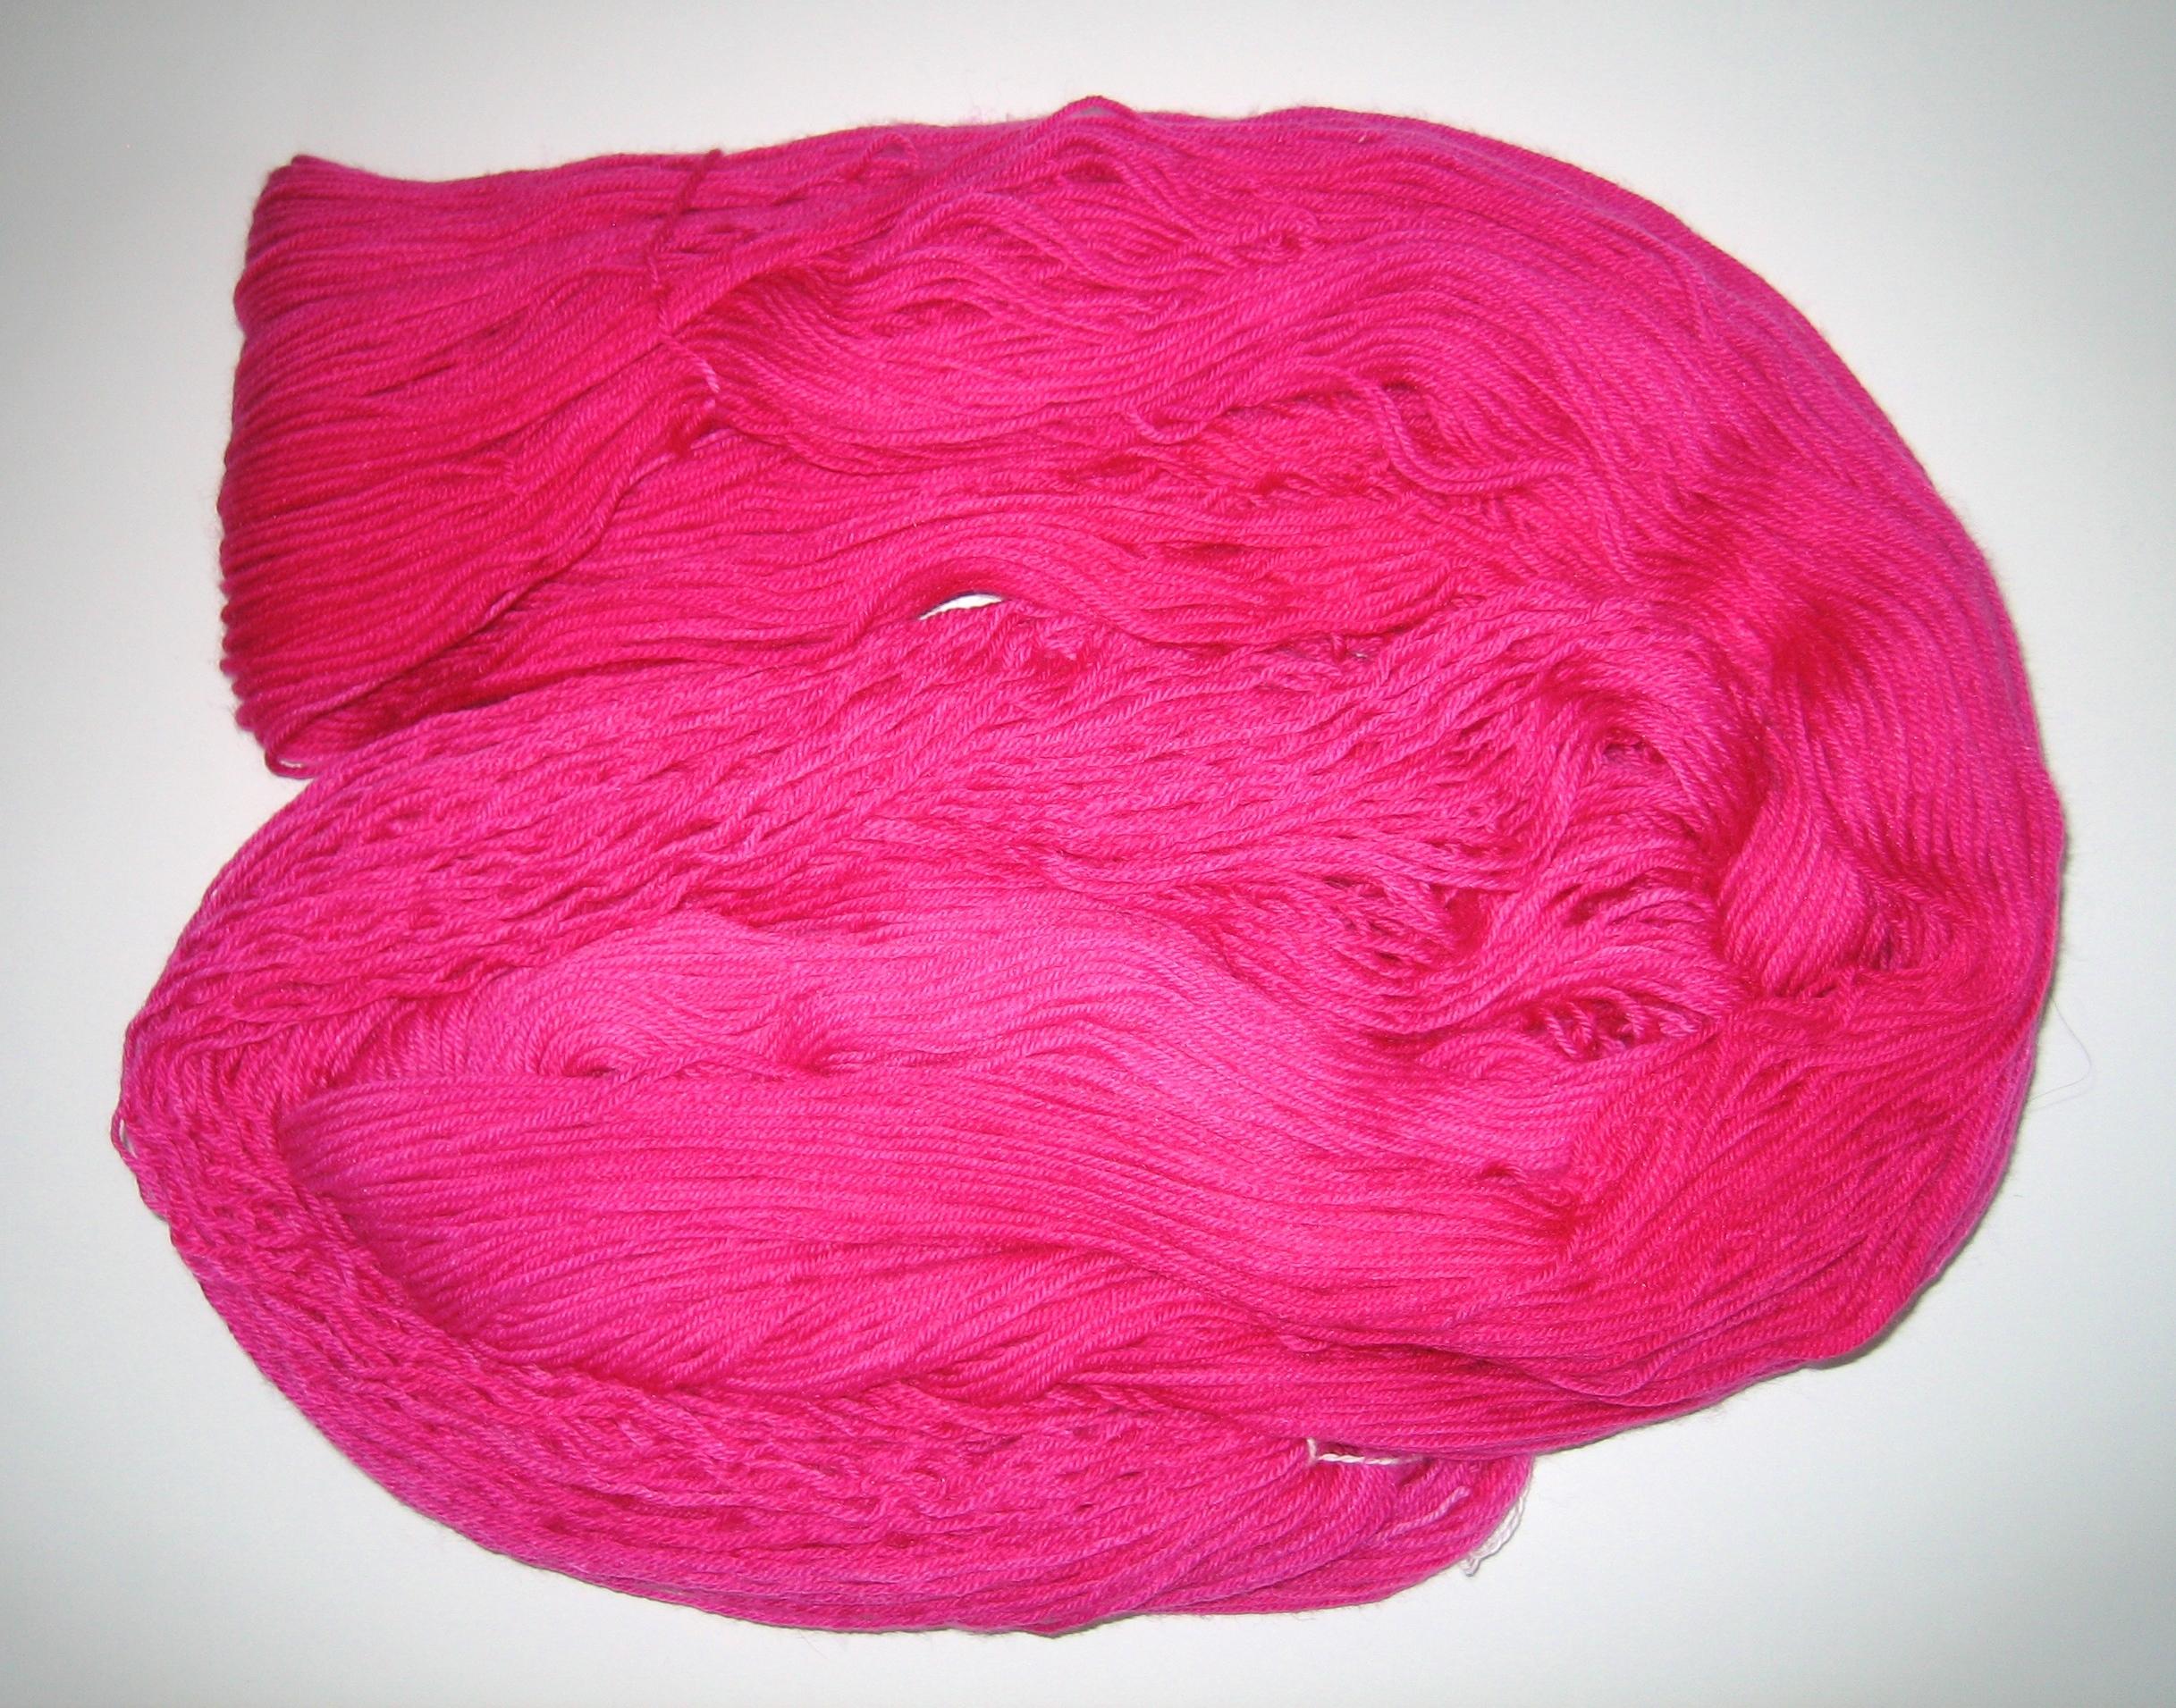 garnyarn-håndfarvet-garn-tynd-merino-nylon-heritage-pink